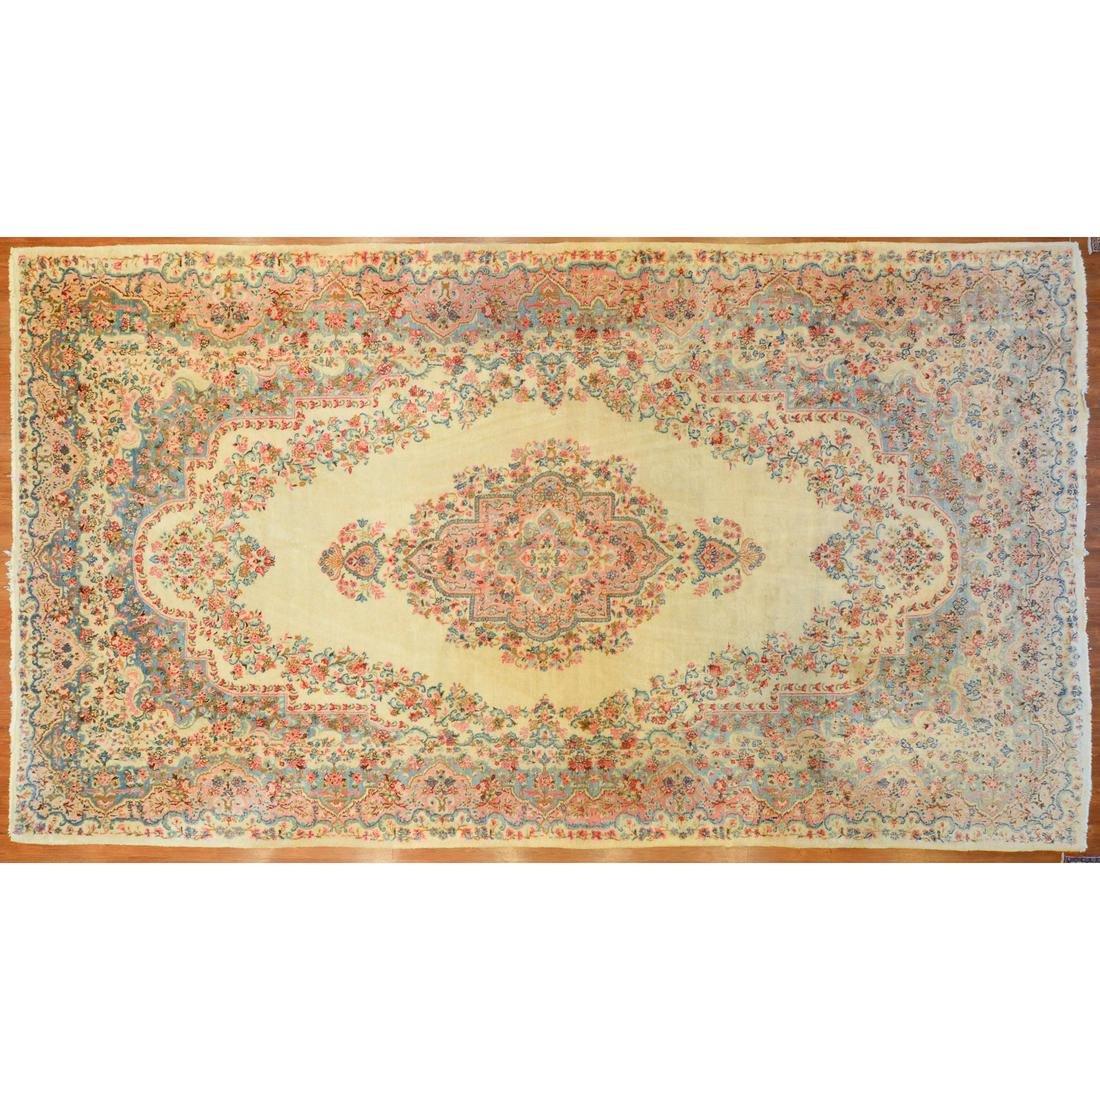 Kazvin Carpet, Persia, 10.1 x 18